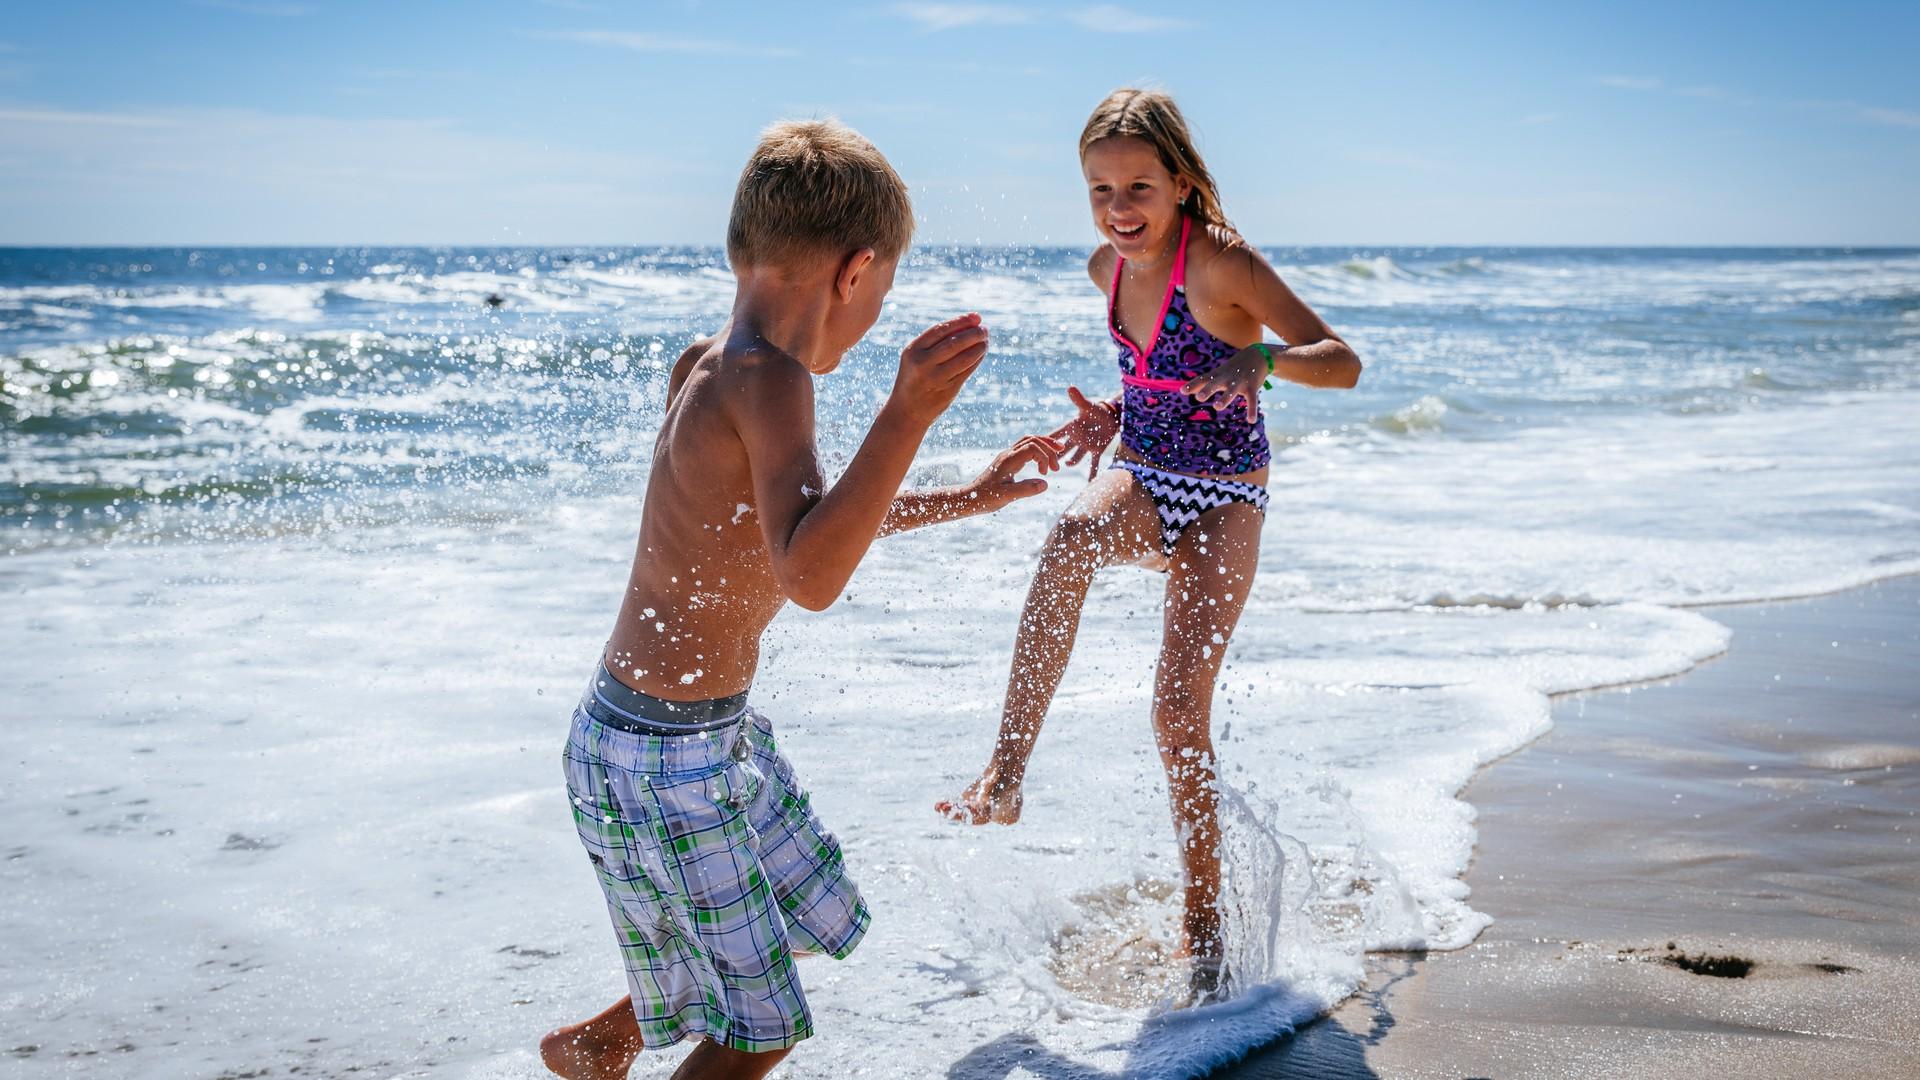 Nicht Jugendfreier Spaß Am Strand